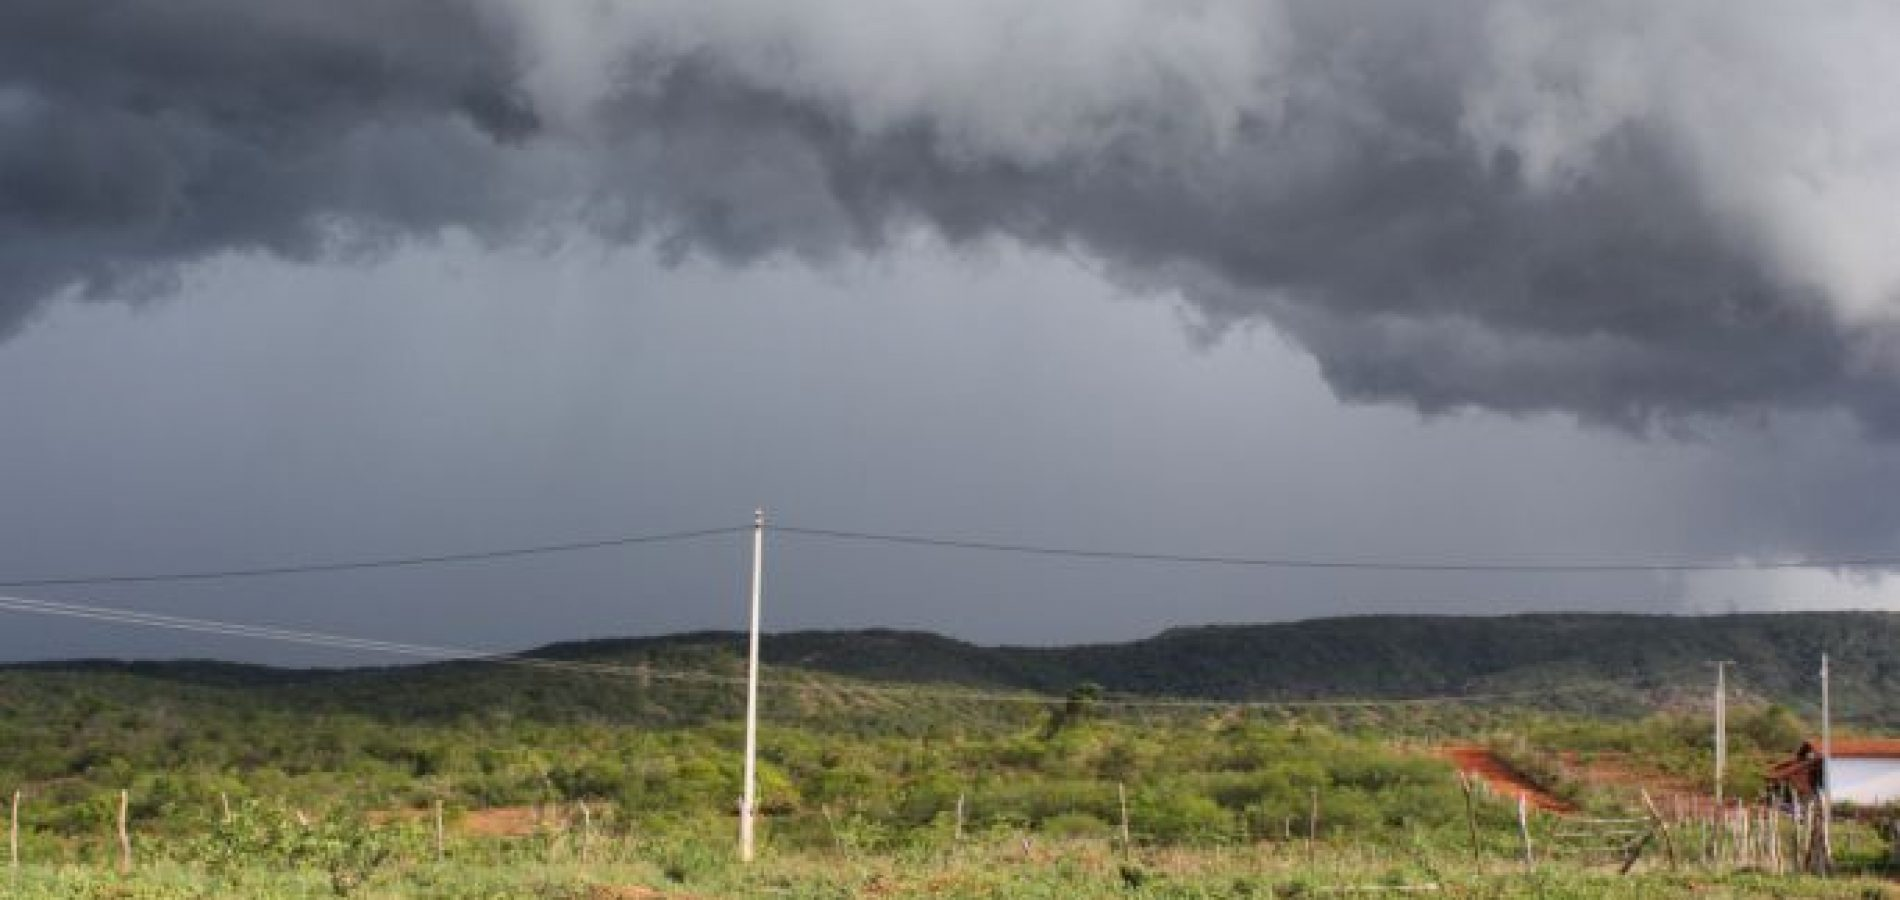 INMET emite alerta para chuvas intensas em 60 municípios do Piauí